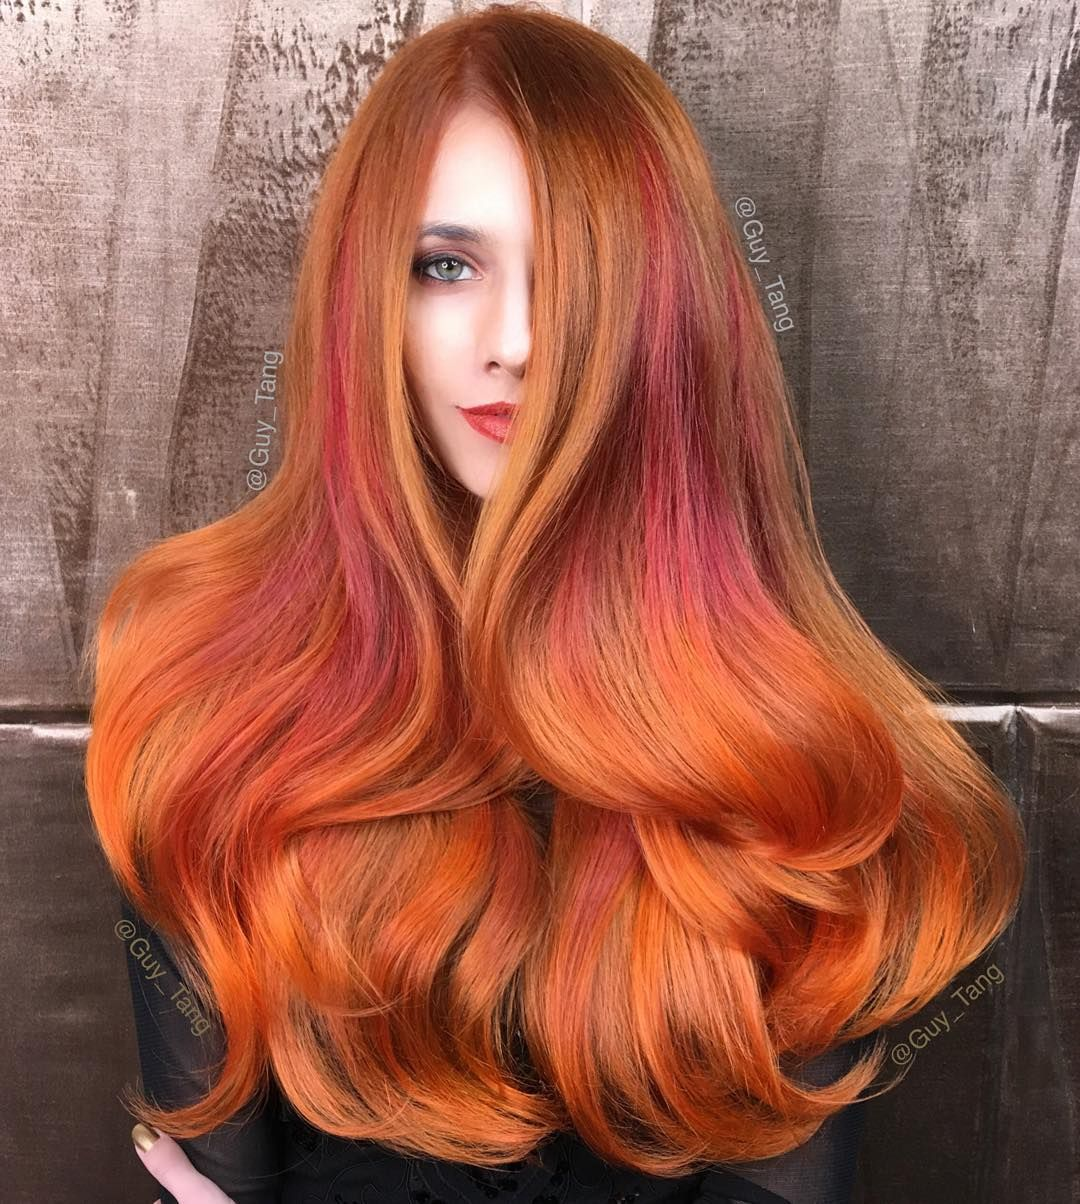 52fda6f8e3c5638faa715e78f917d345 - Золотисто медный цвет волос, оттенки, фото, краска